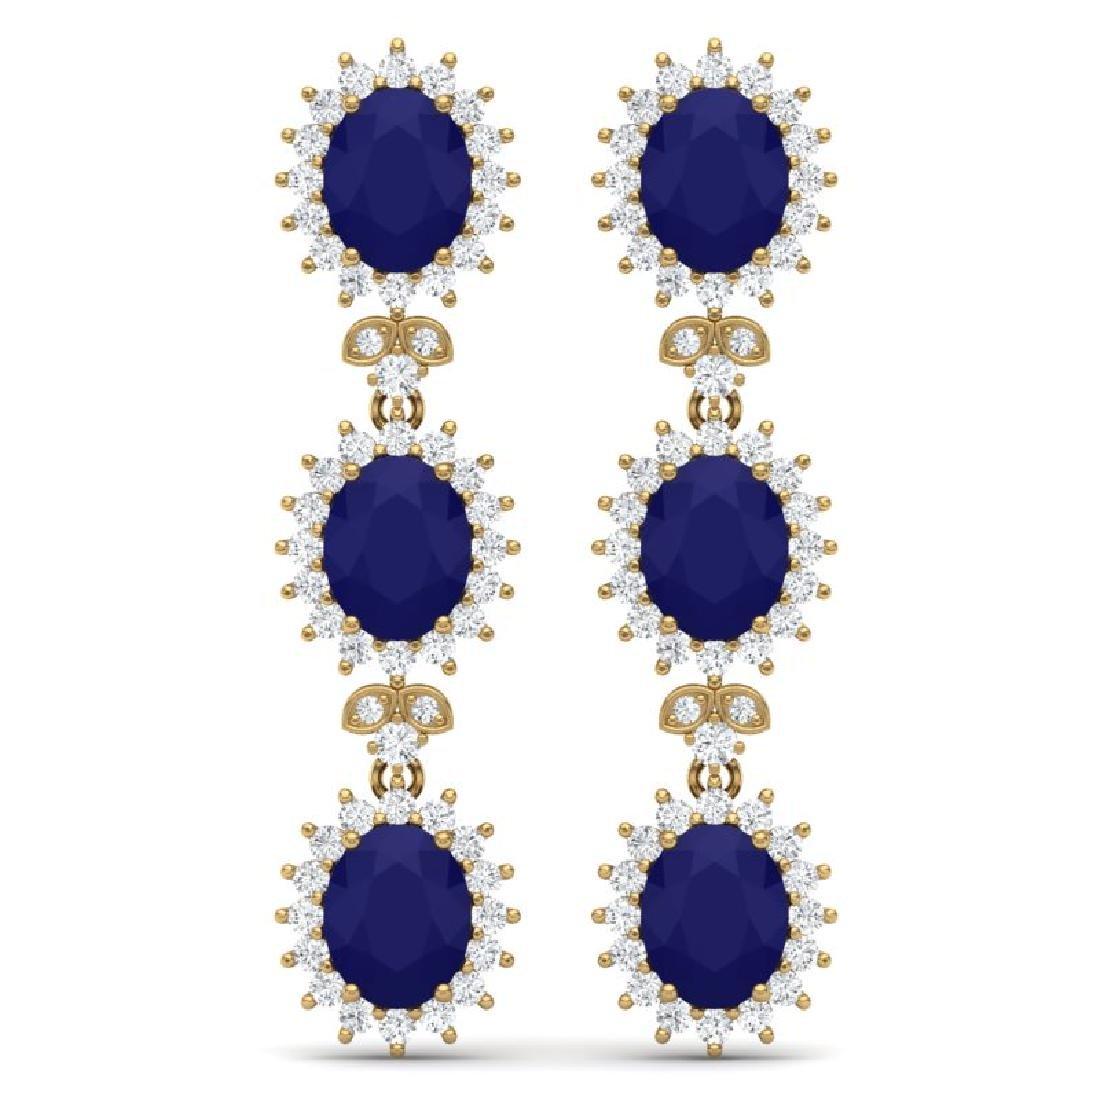 24.52 CTW Royalty Sapphire & VS Diamond Earrings 18K